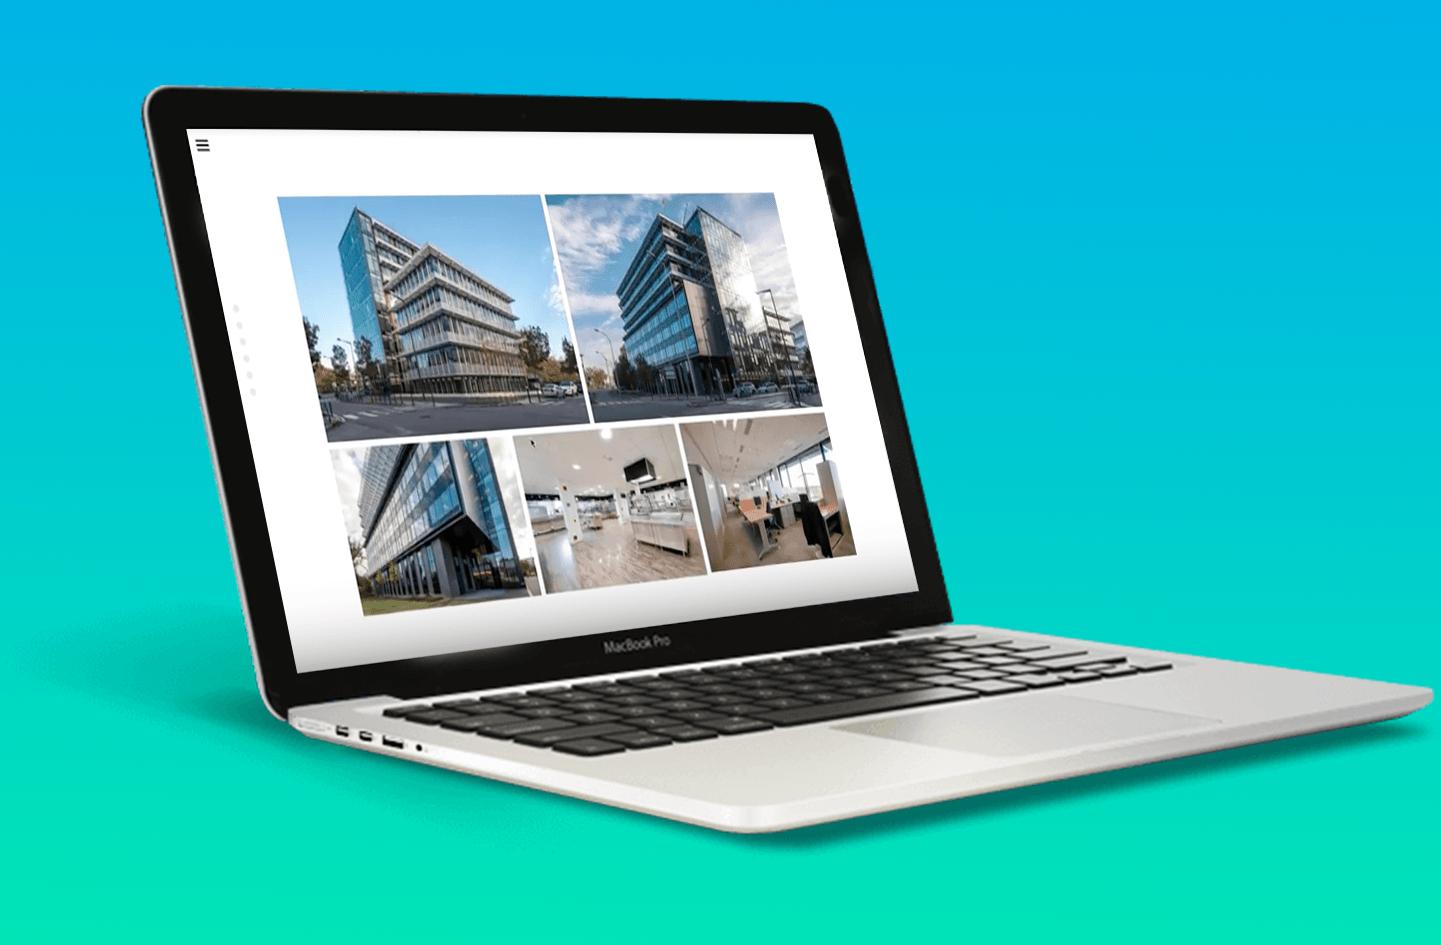 développement web design responsive arizona asset management likeweb paris agence studio wordpress